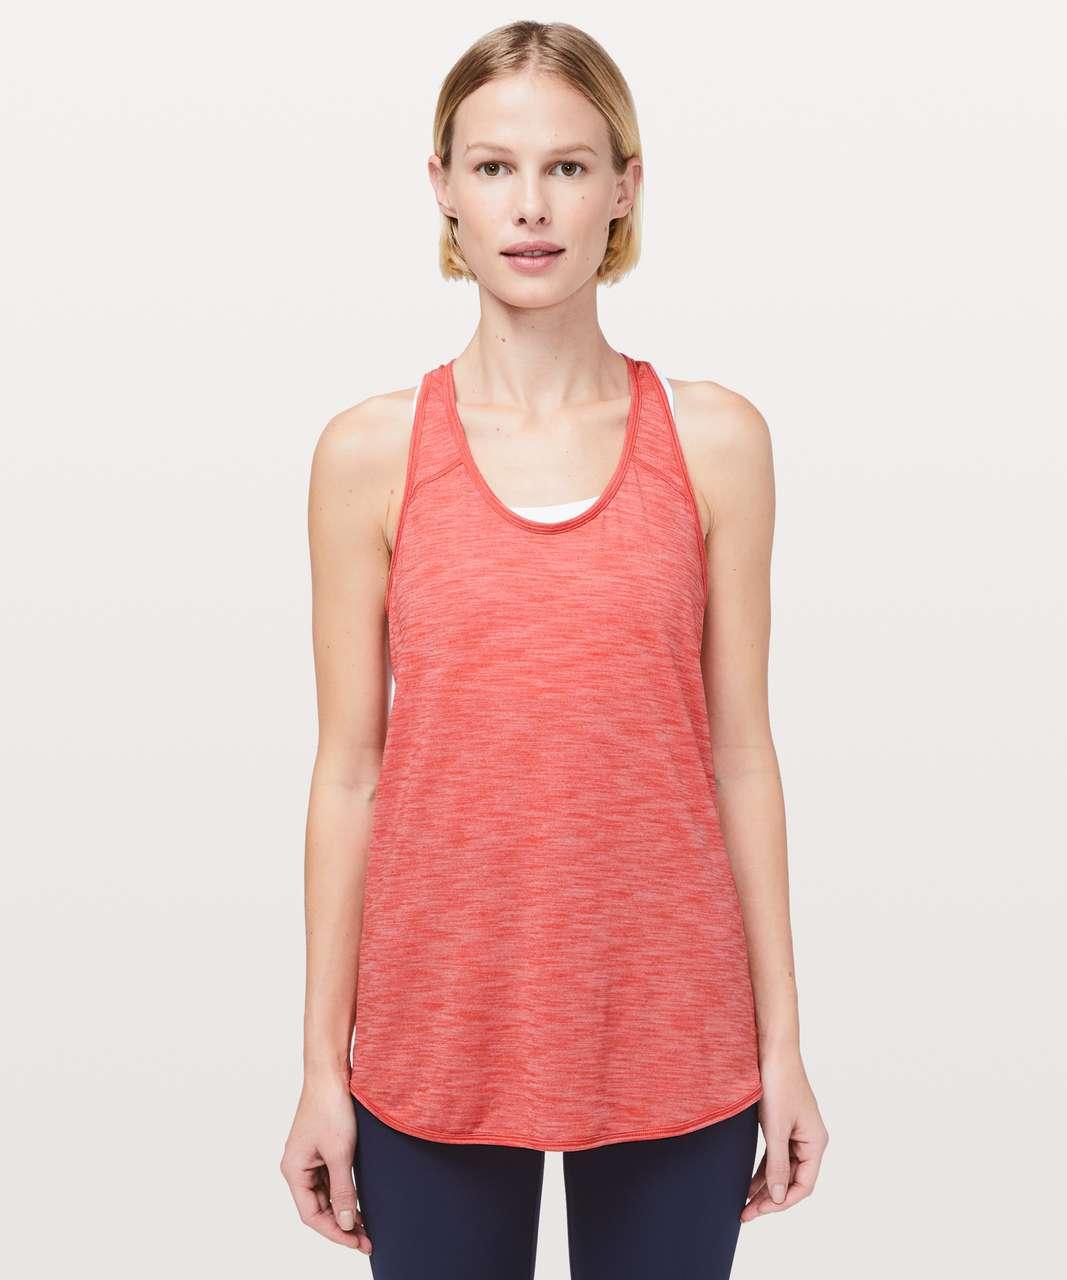 Lululemon Essential Tank - Heathered Poppy Coral